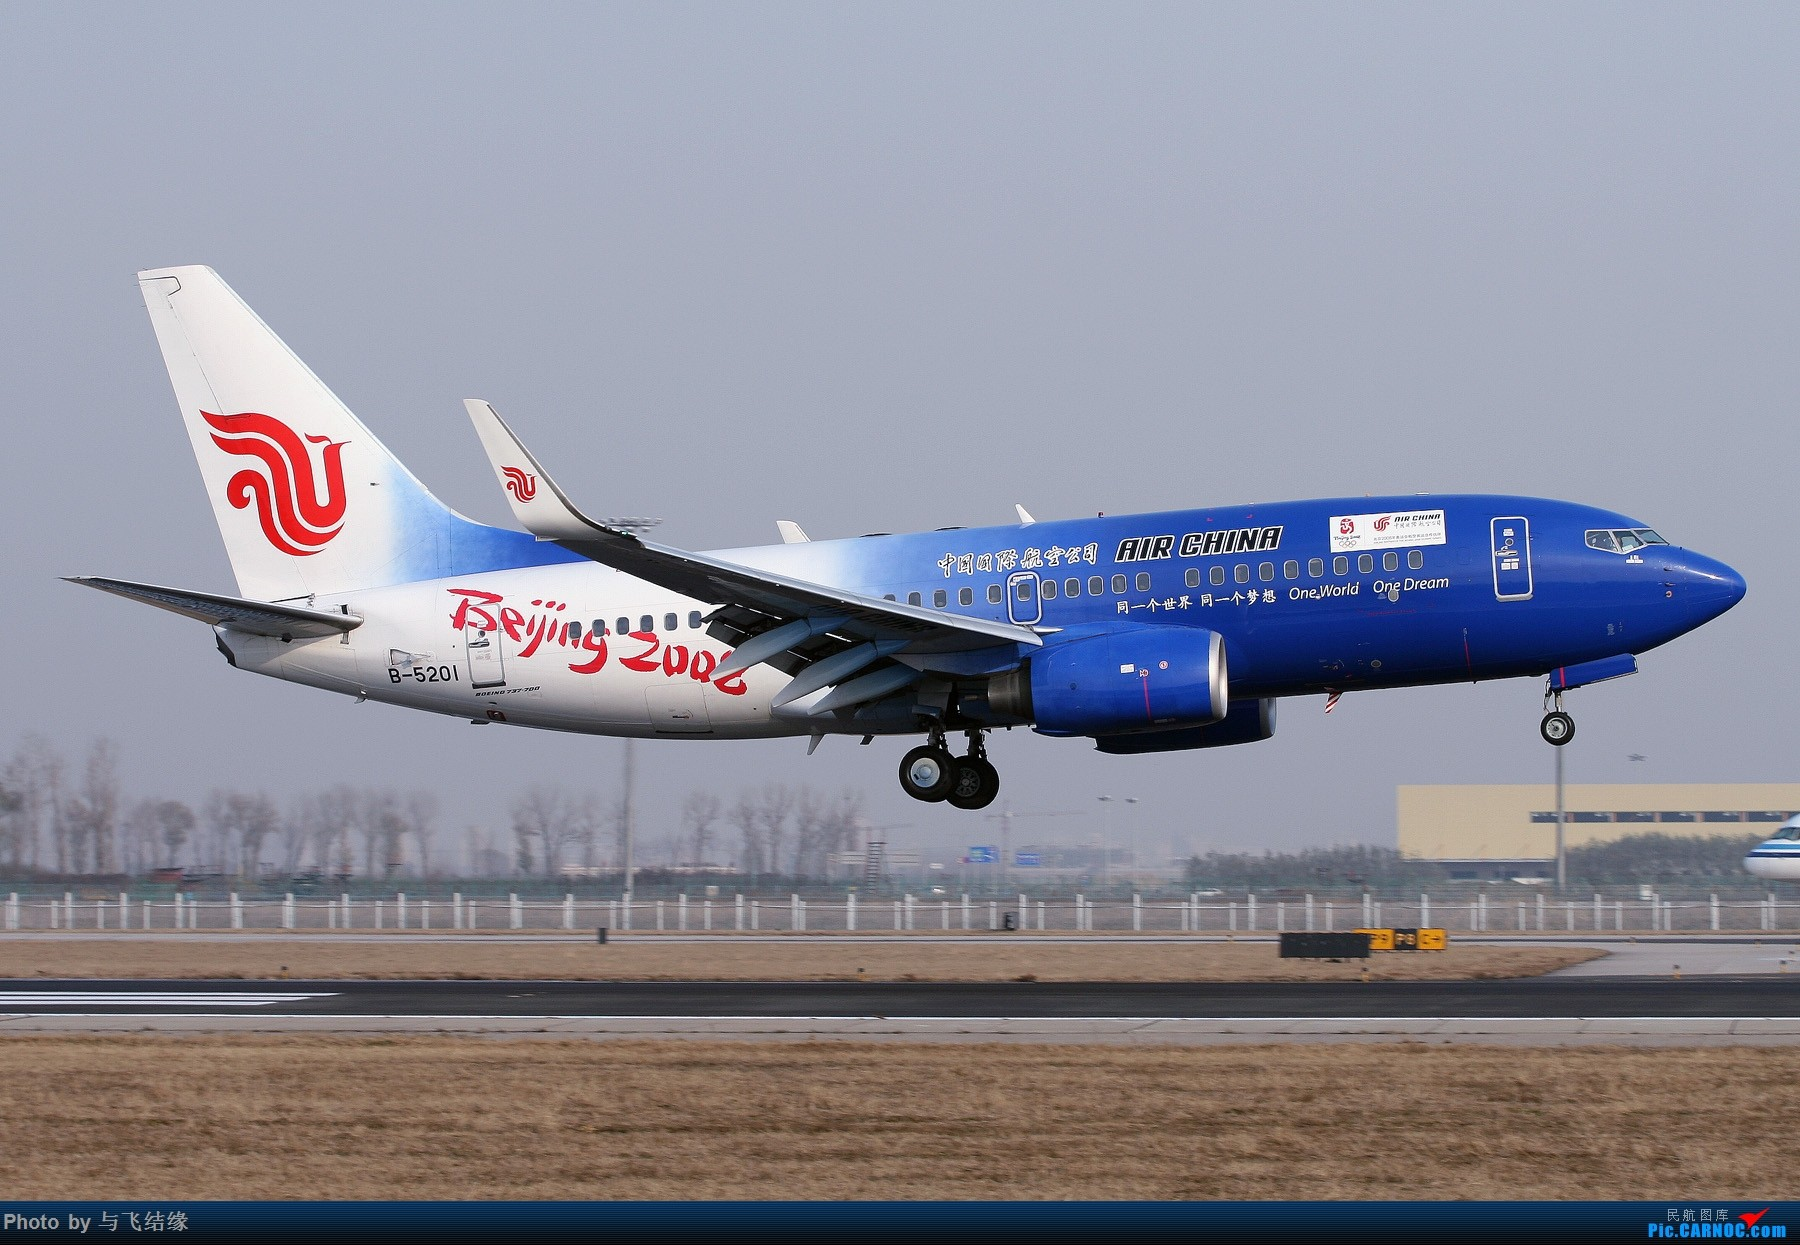 Re:[公告]传承奥运精神 寻找那些年曾经拍过的国航奥运彩绘机~ 贴图有大奖哦!!! BOEING 737-700 B-5201 中国北京首都国际机场